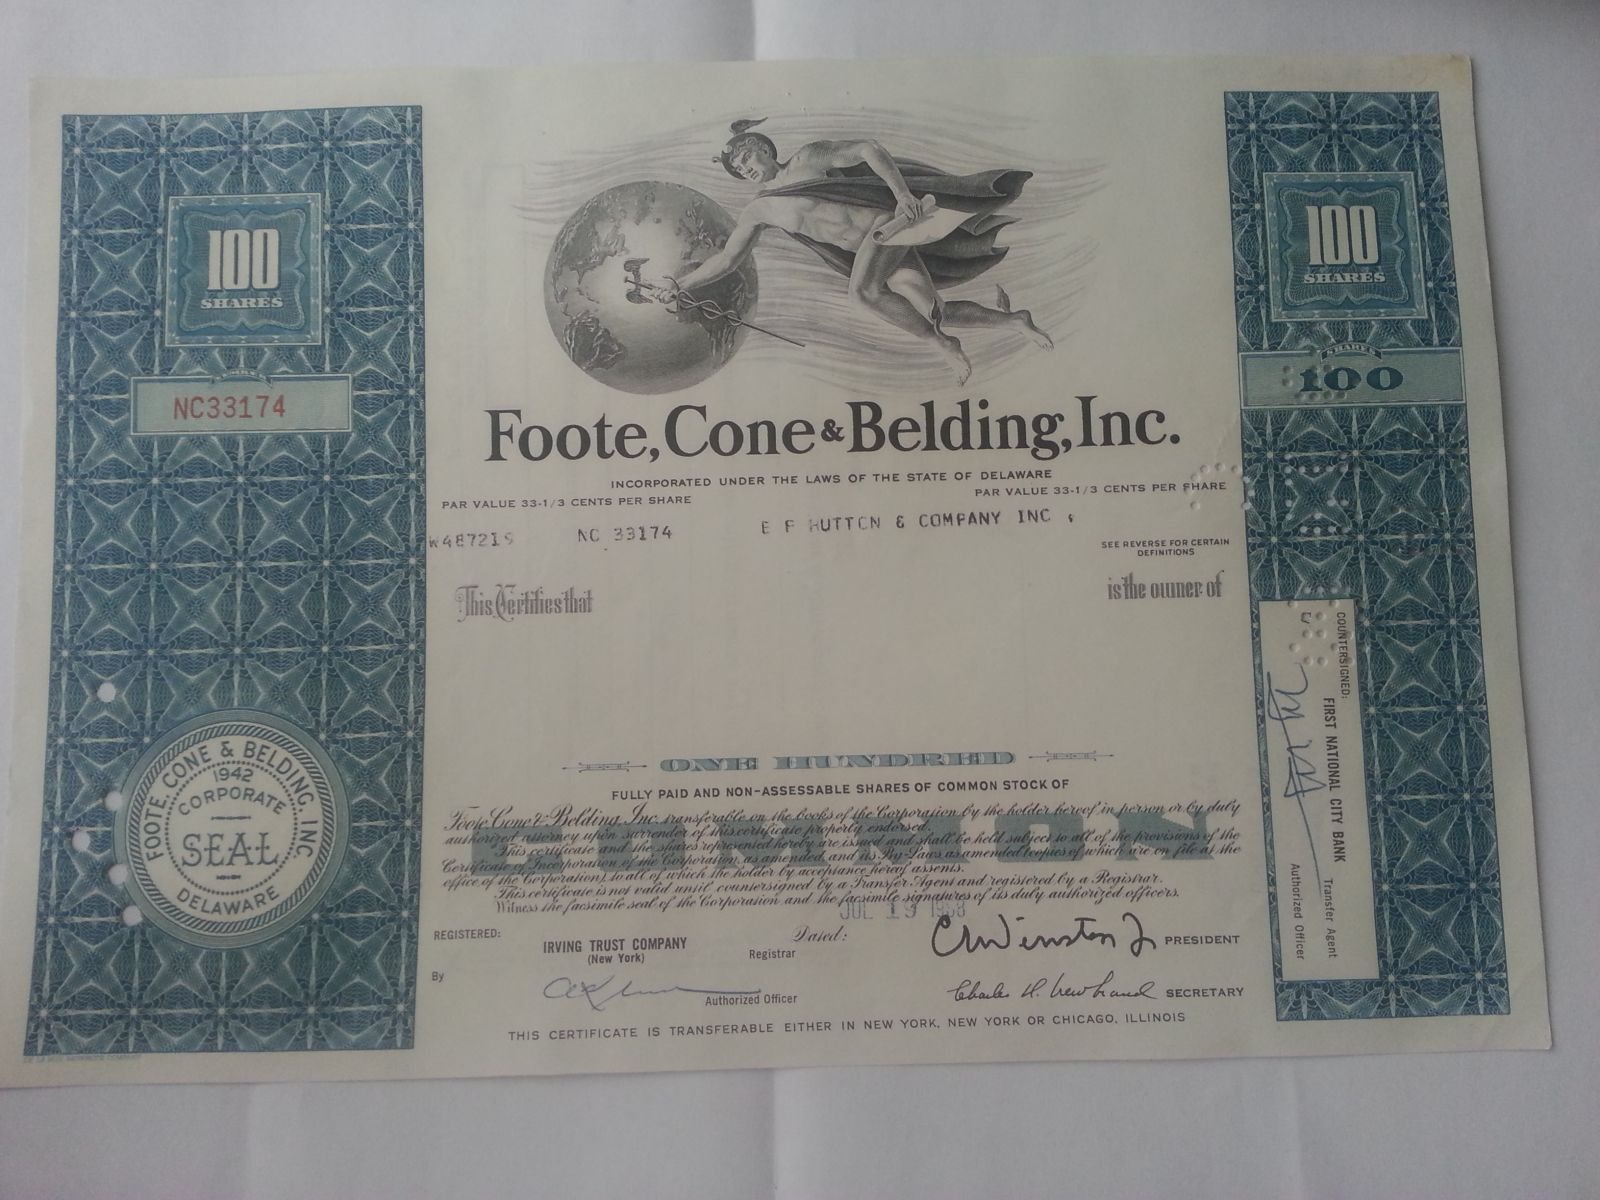 USA-akcie- Foote, Cone, Beldine, 1968, USA